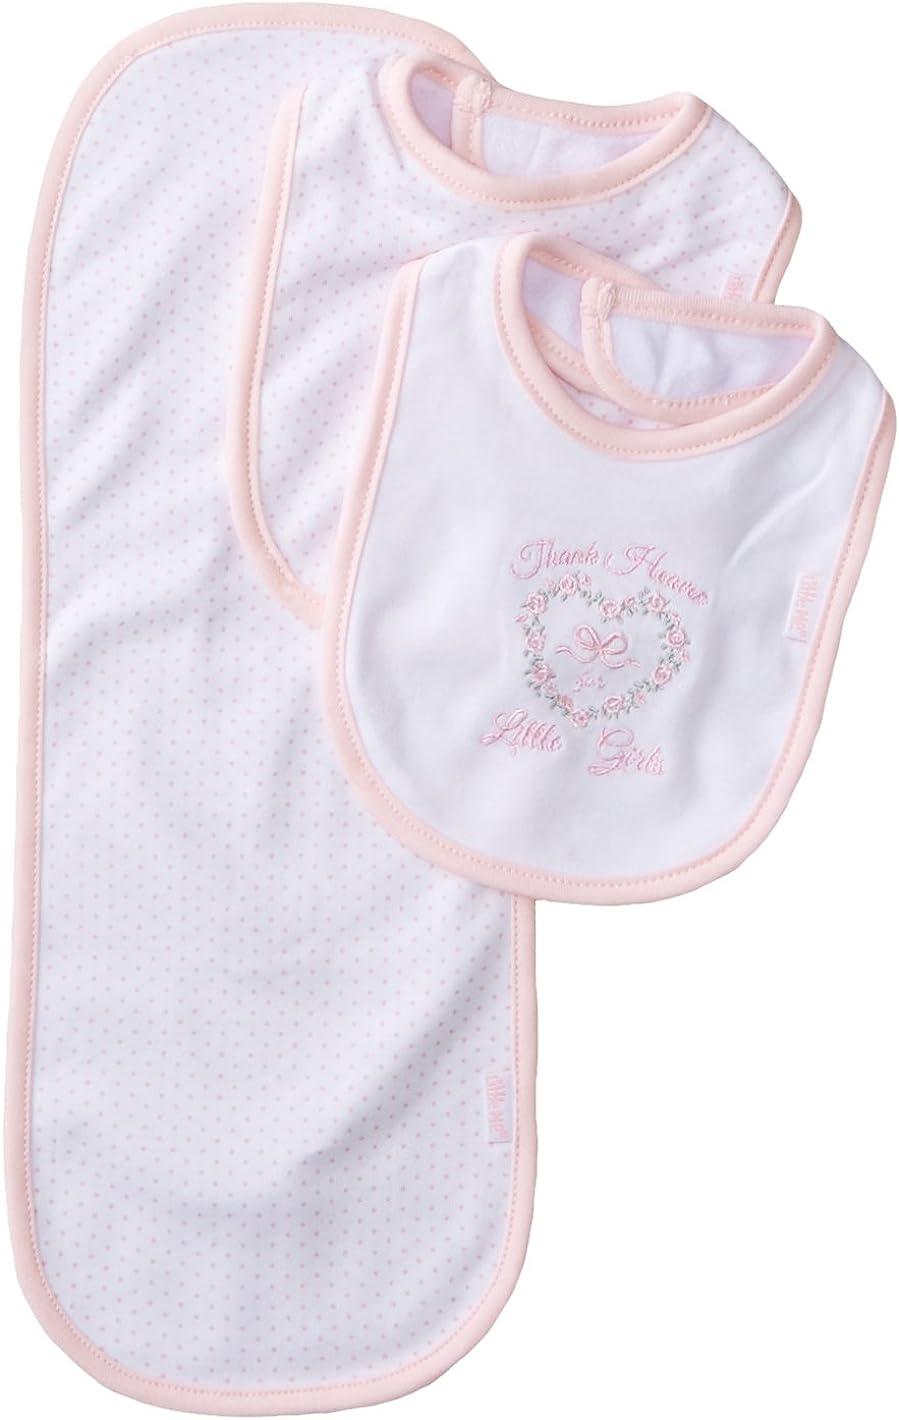 Little Me overseas Baby Girls' 3 and Piece Set Bib Tulsa Mall Burp